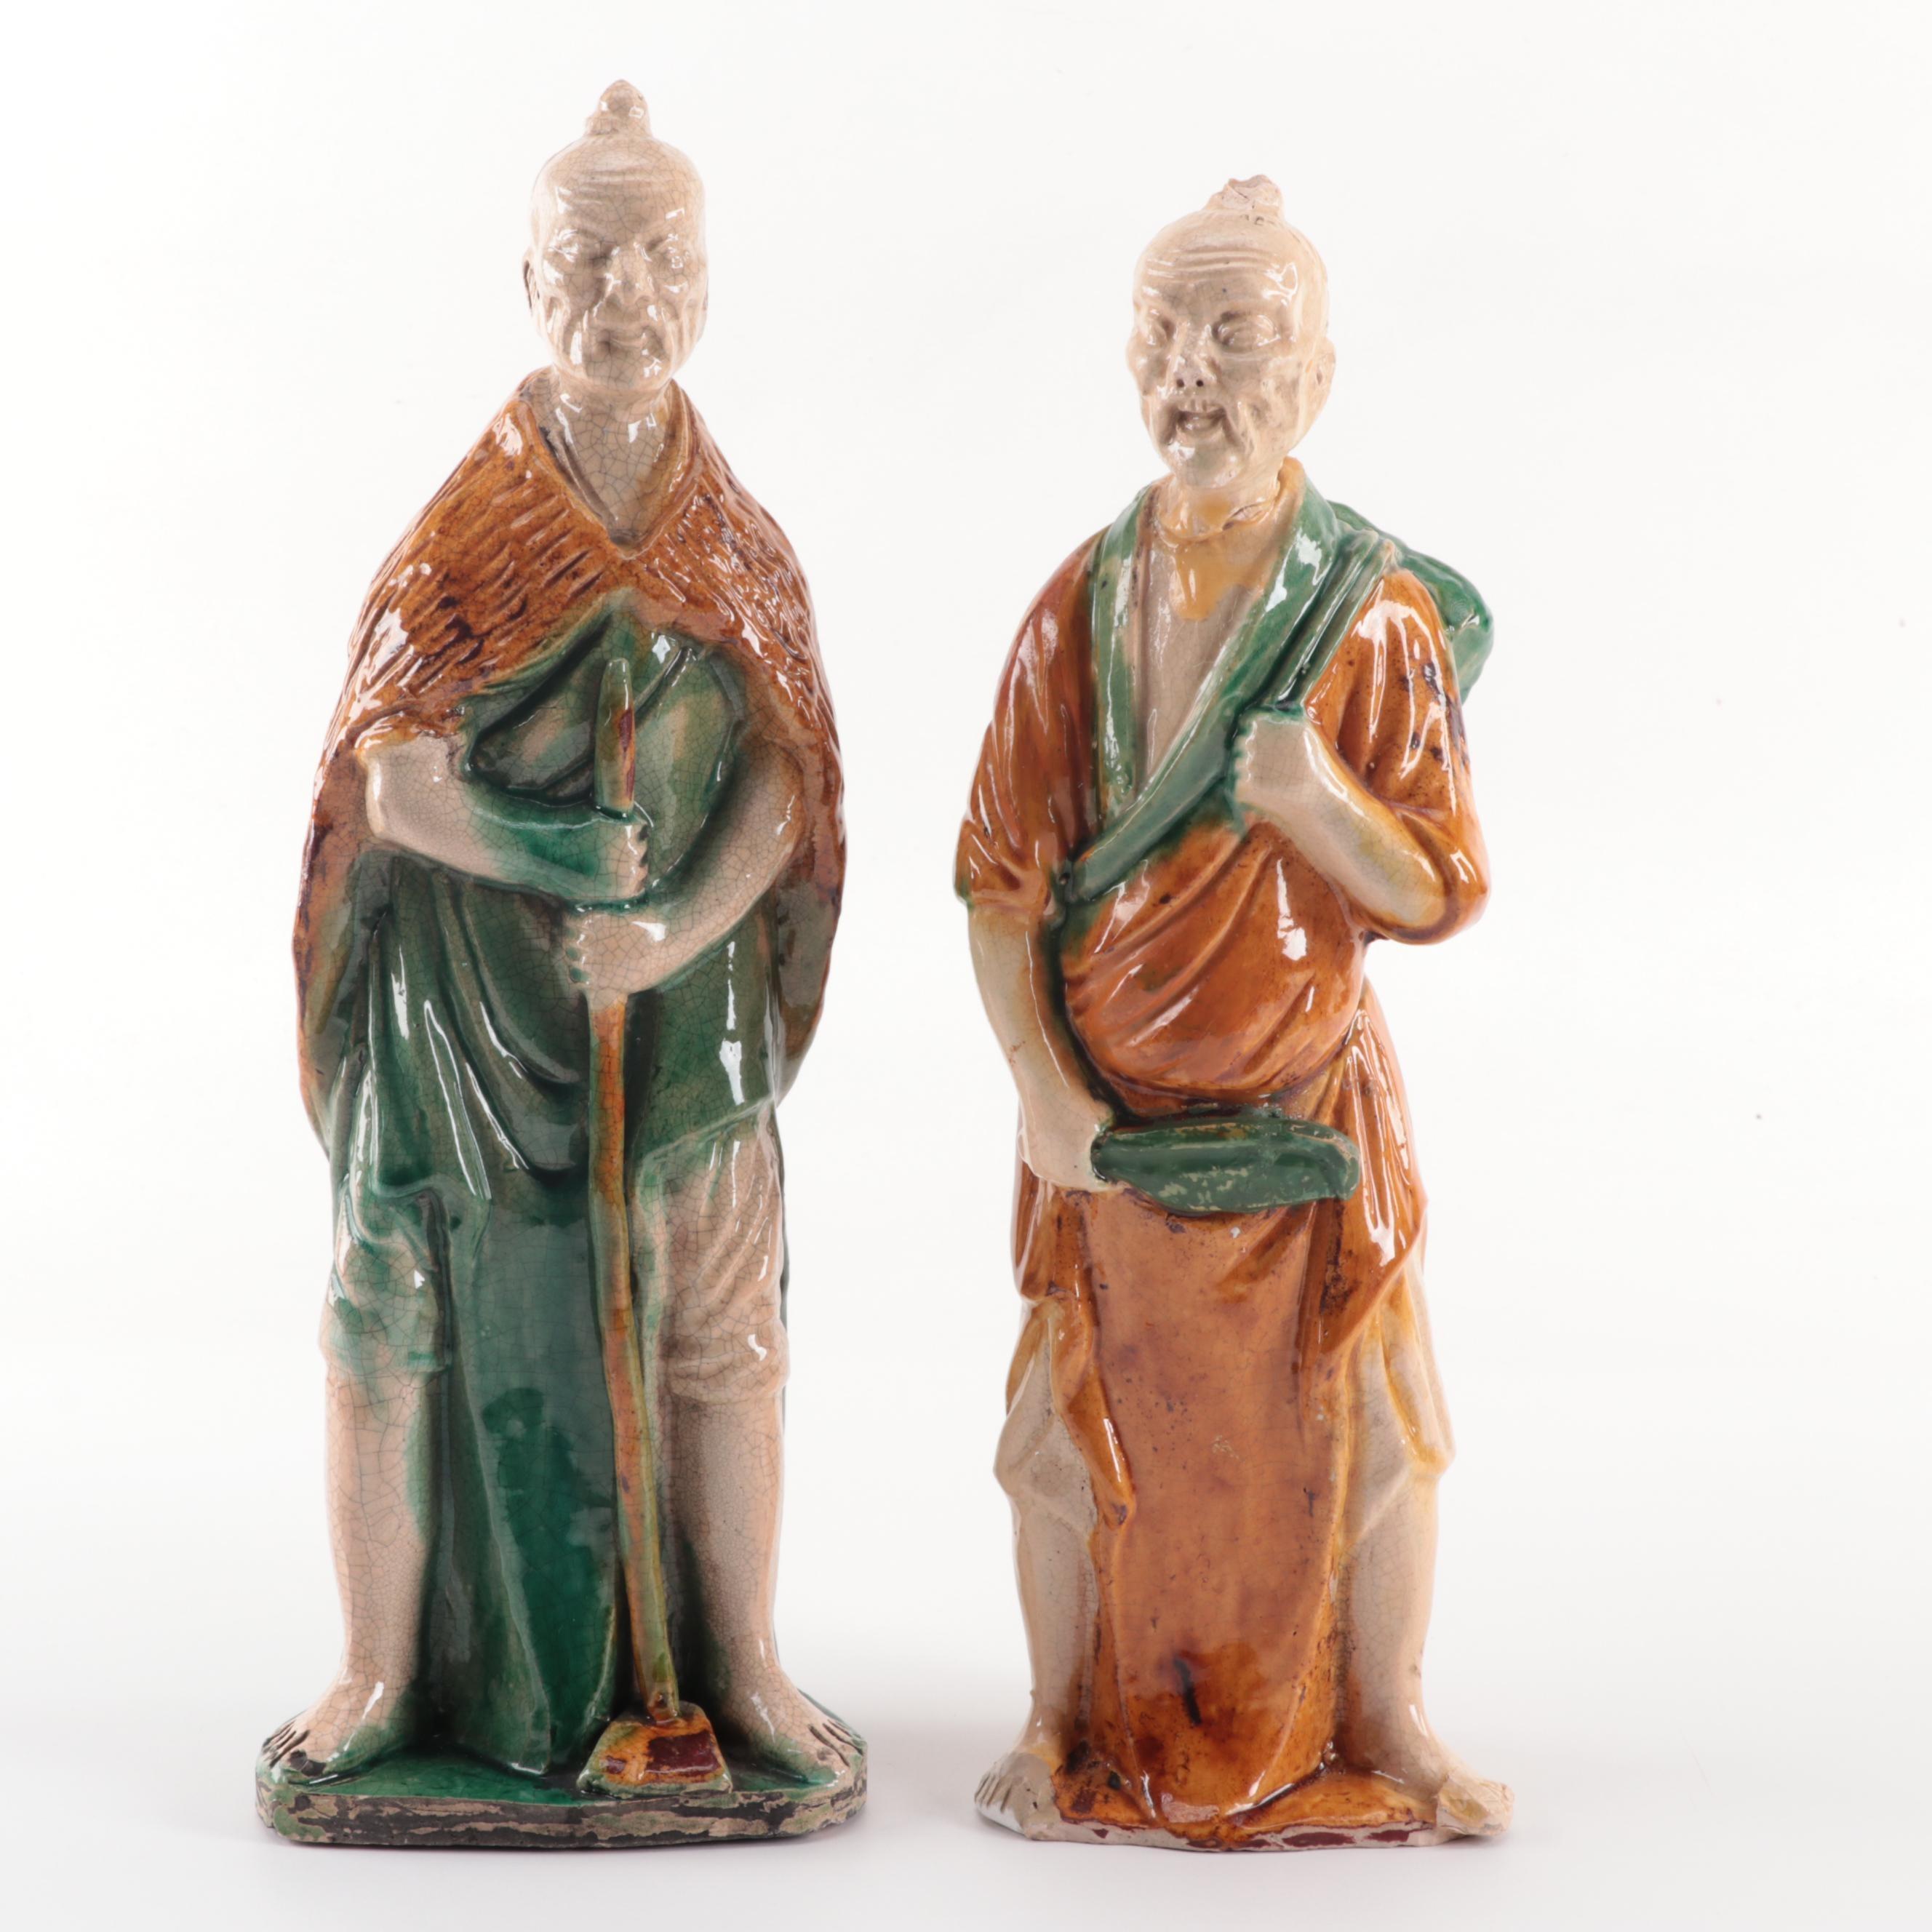 Chinese Sancai Glazed Ceramic Figurines